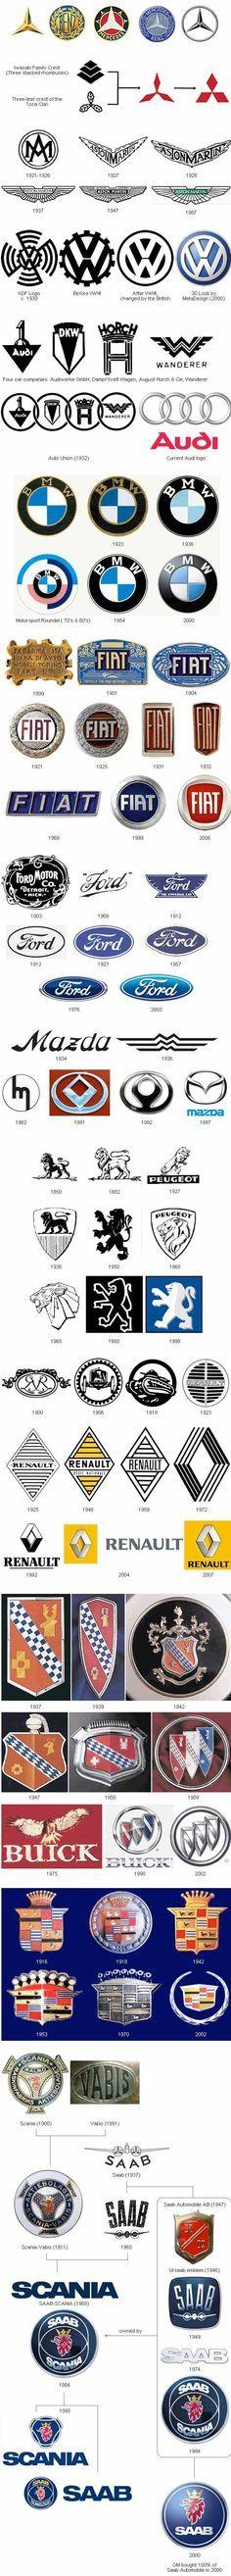 Top Car Brands Symbols 4k Pictures 4k Pictures Full Hq Wallpaper